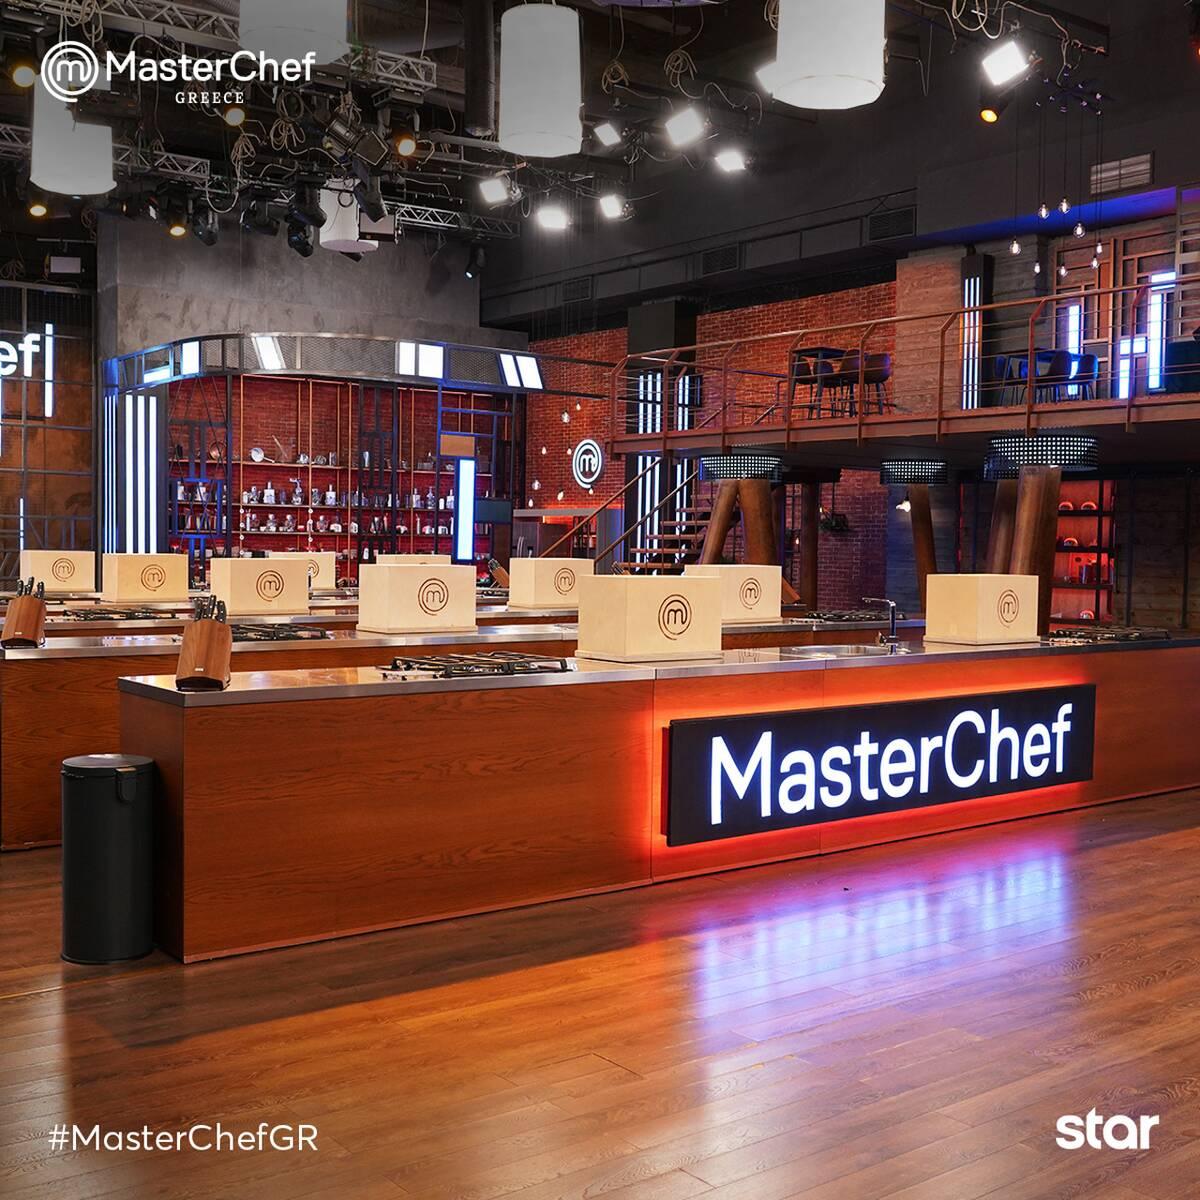 MasterChef: Μεγάλη ανατροπή απόψε! Τι αλλάζει στο ριάλιτι; Σαστίζουν οι παίκτες